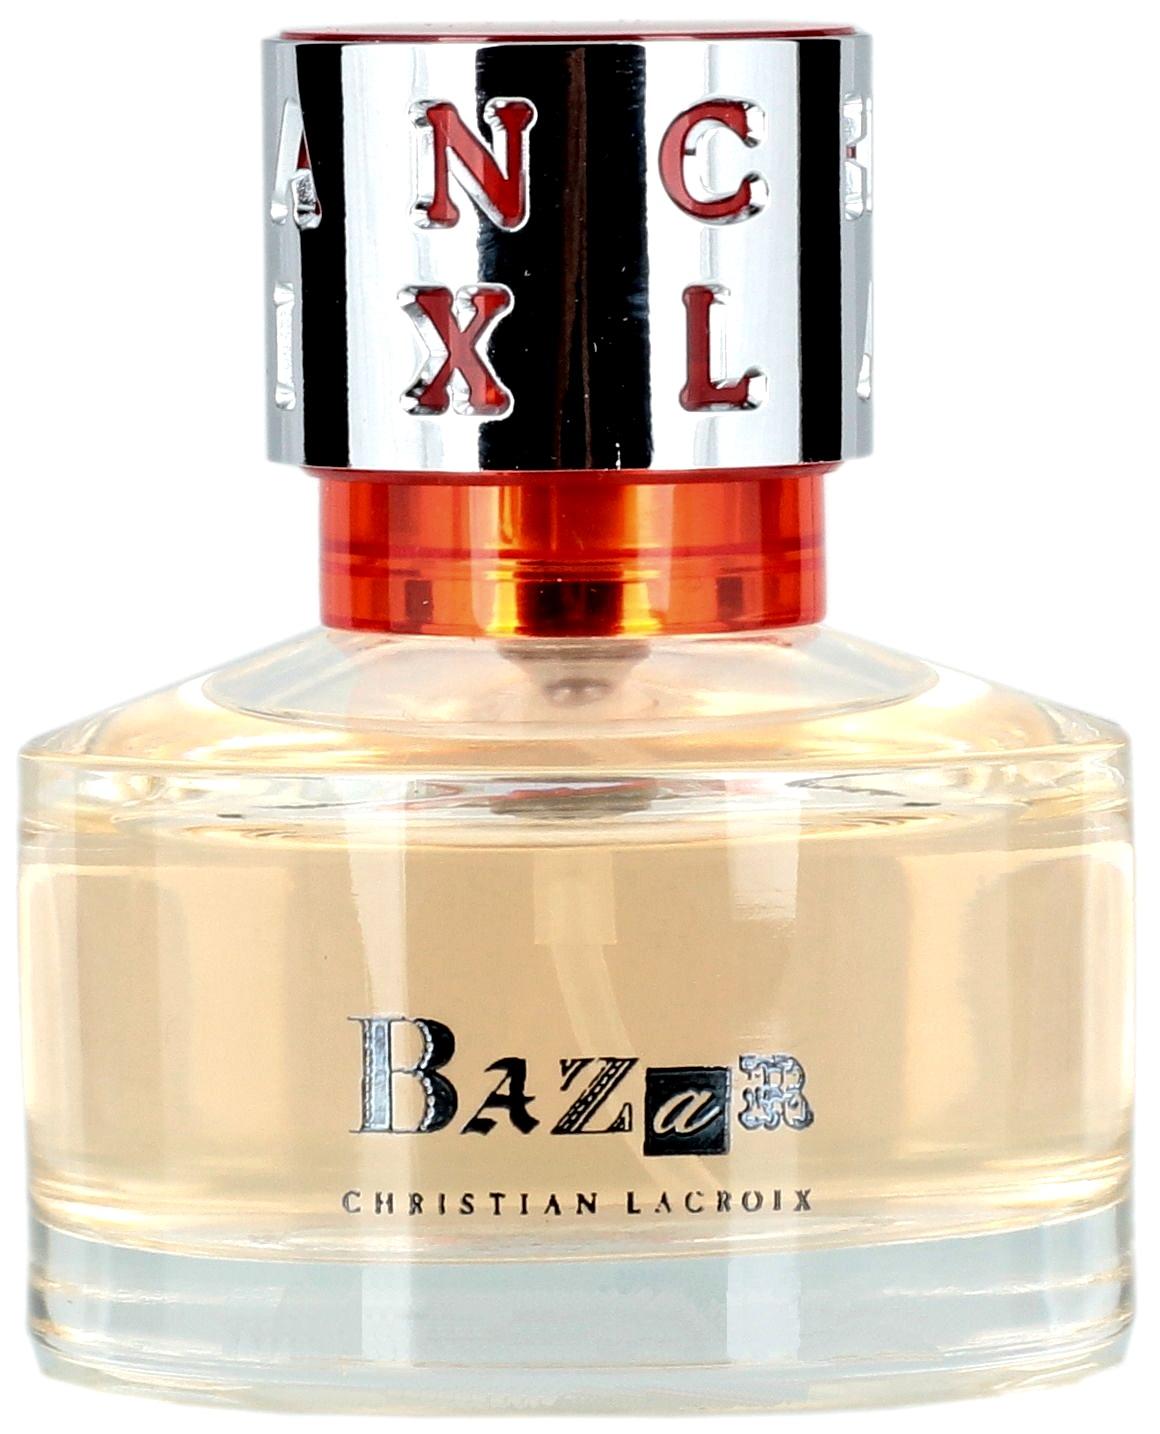 Christian Lacroix Bazar for women 2002 парфюмированная вода 50мл (Кристиан Лакруа Базар для Женщин 2002)